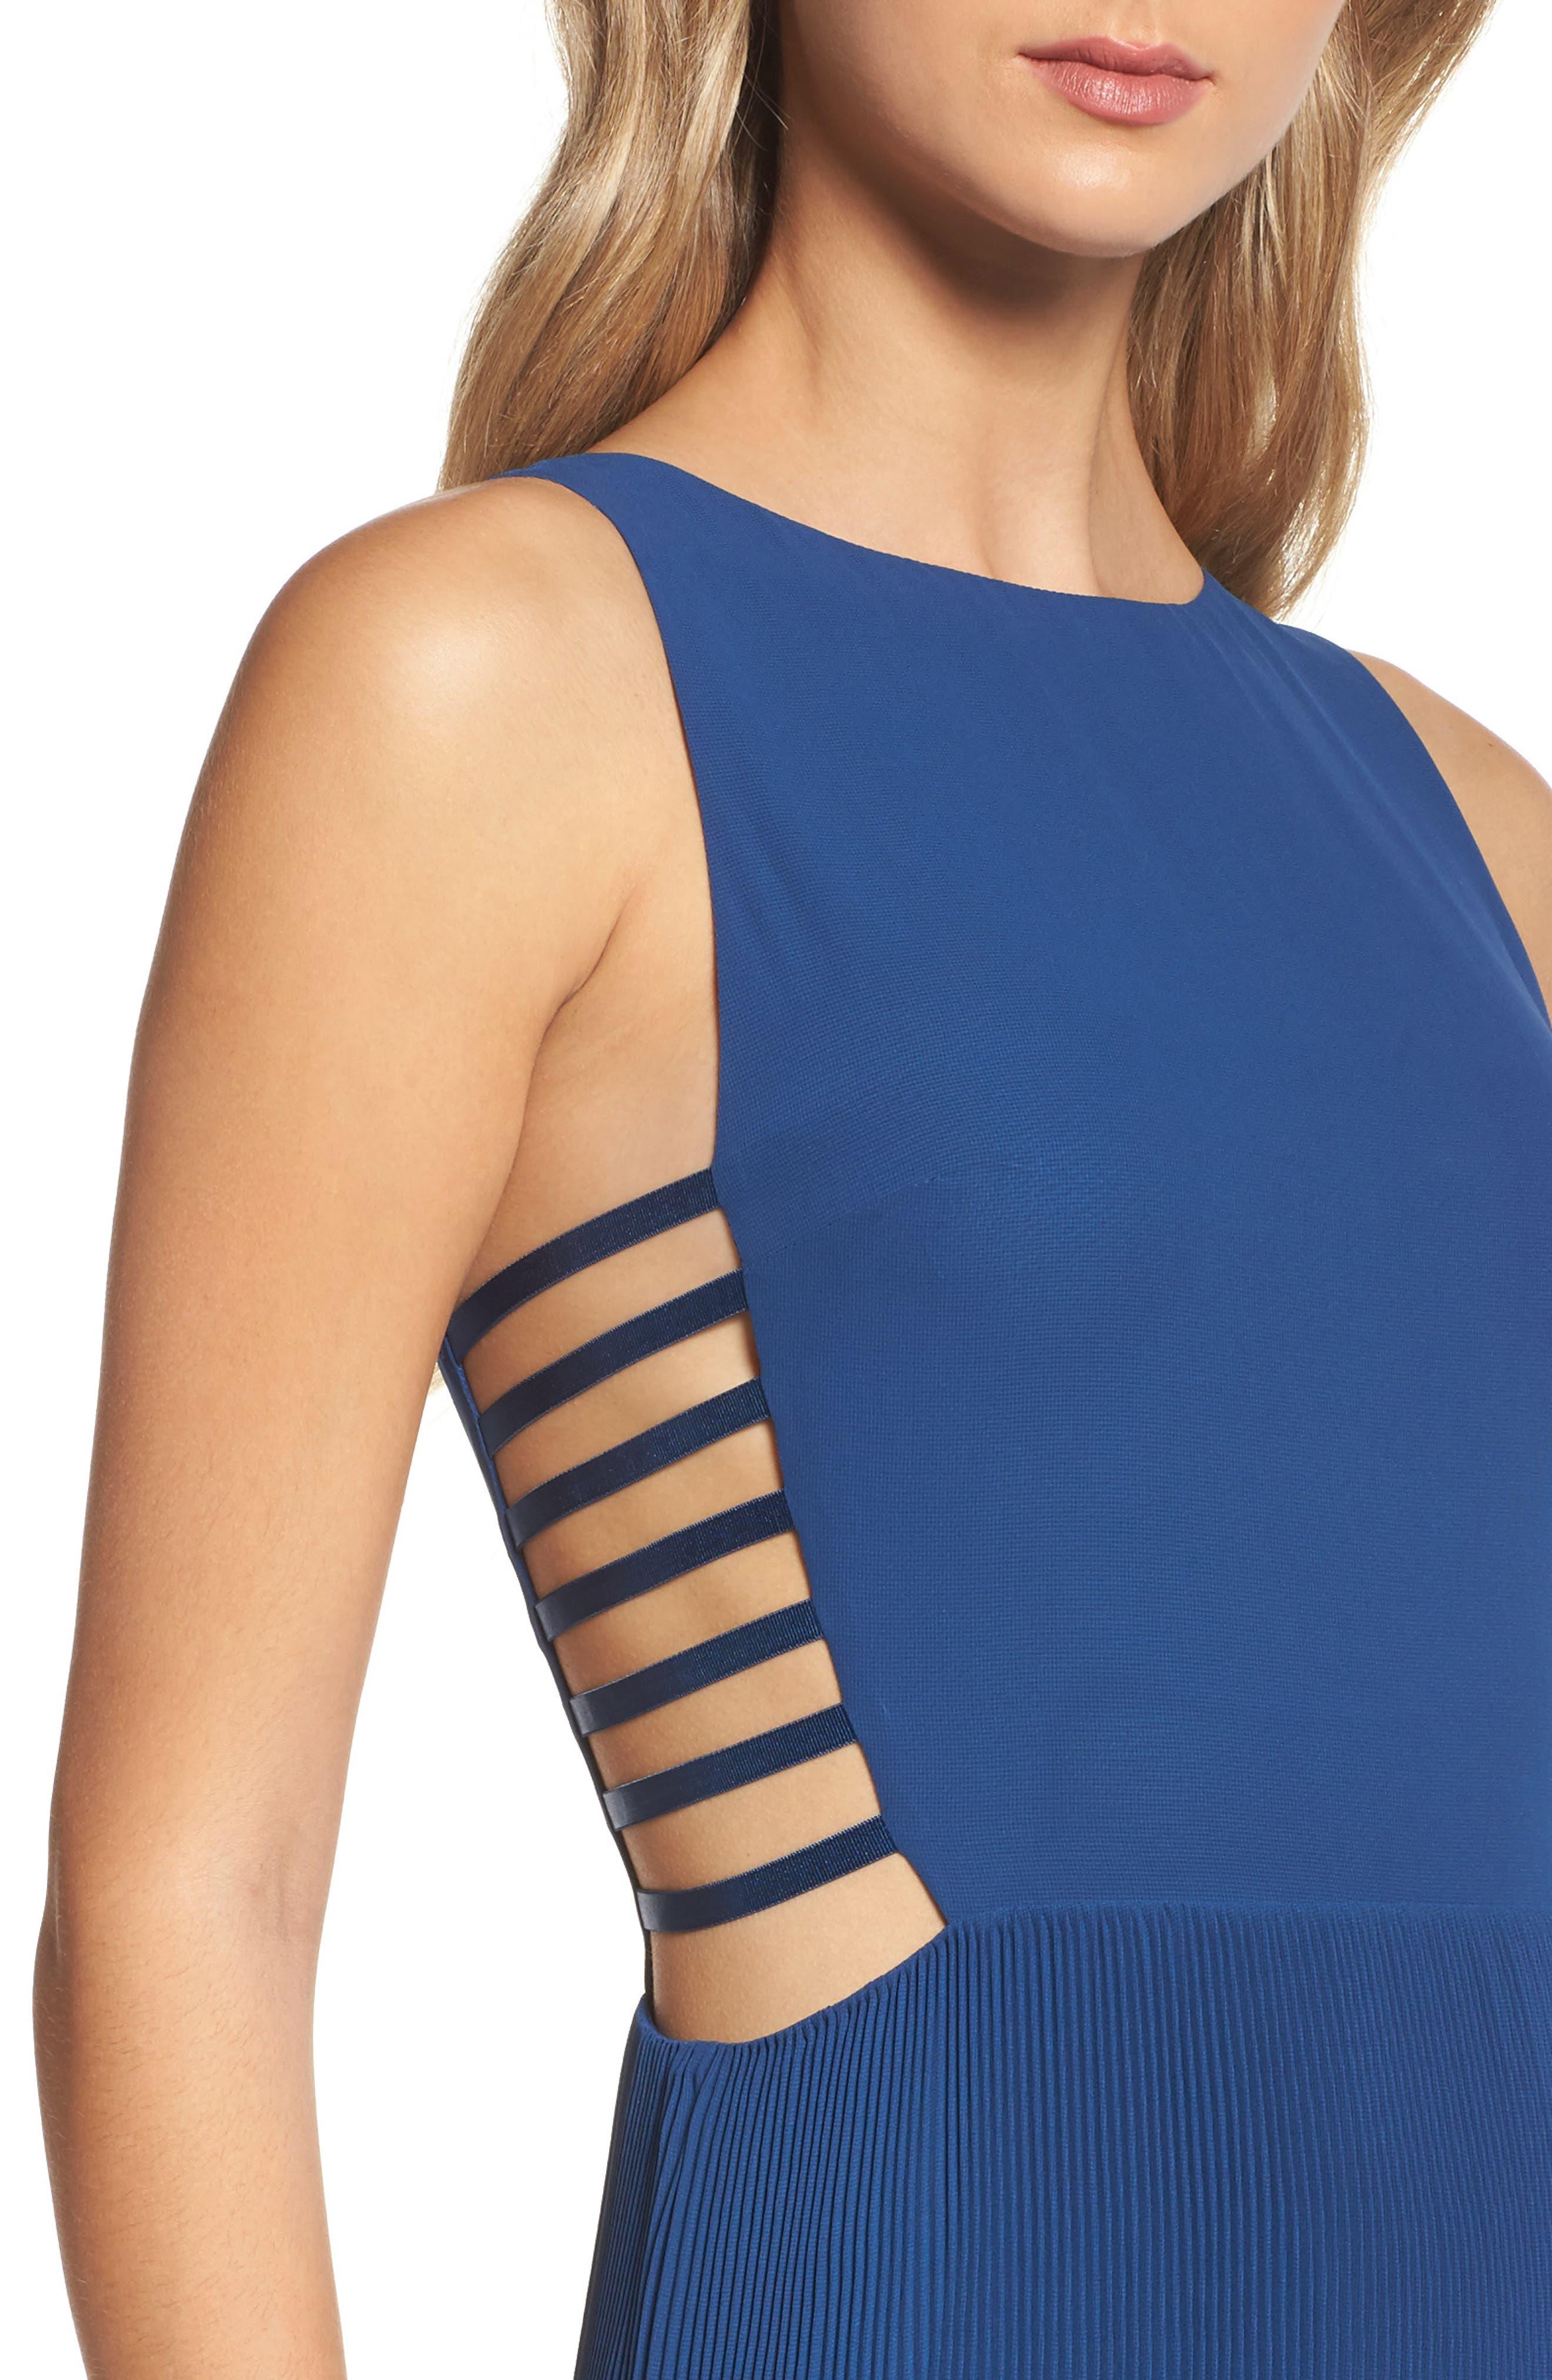 Sunset Blvd Maxi Dress,                             Alternate thumbnail 5, color,                             French Blue